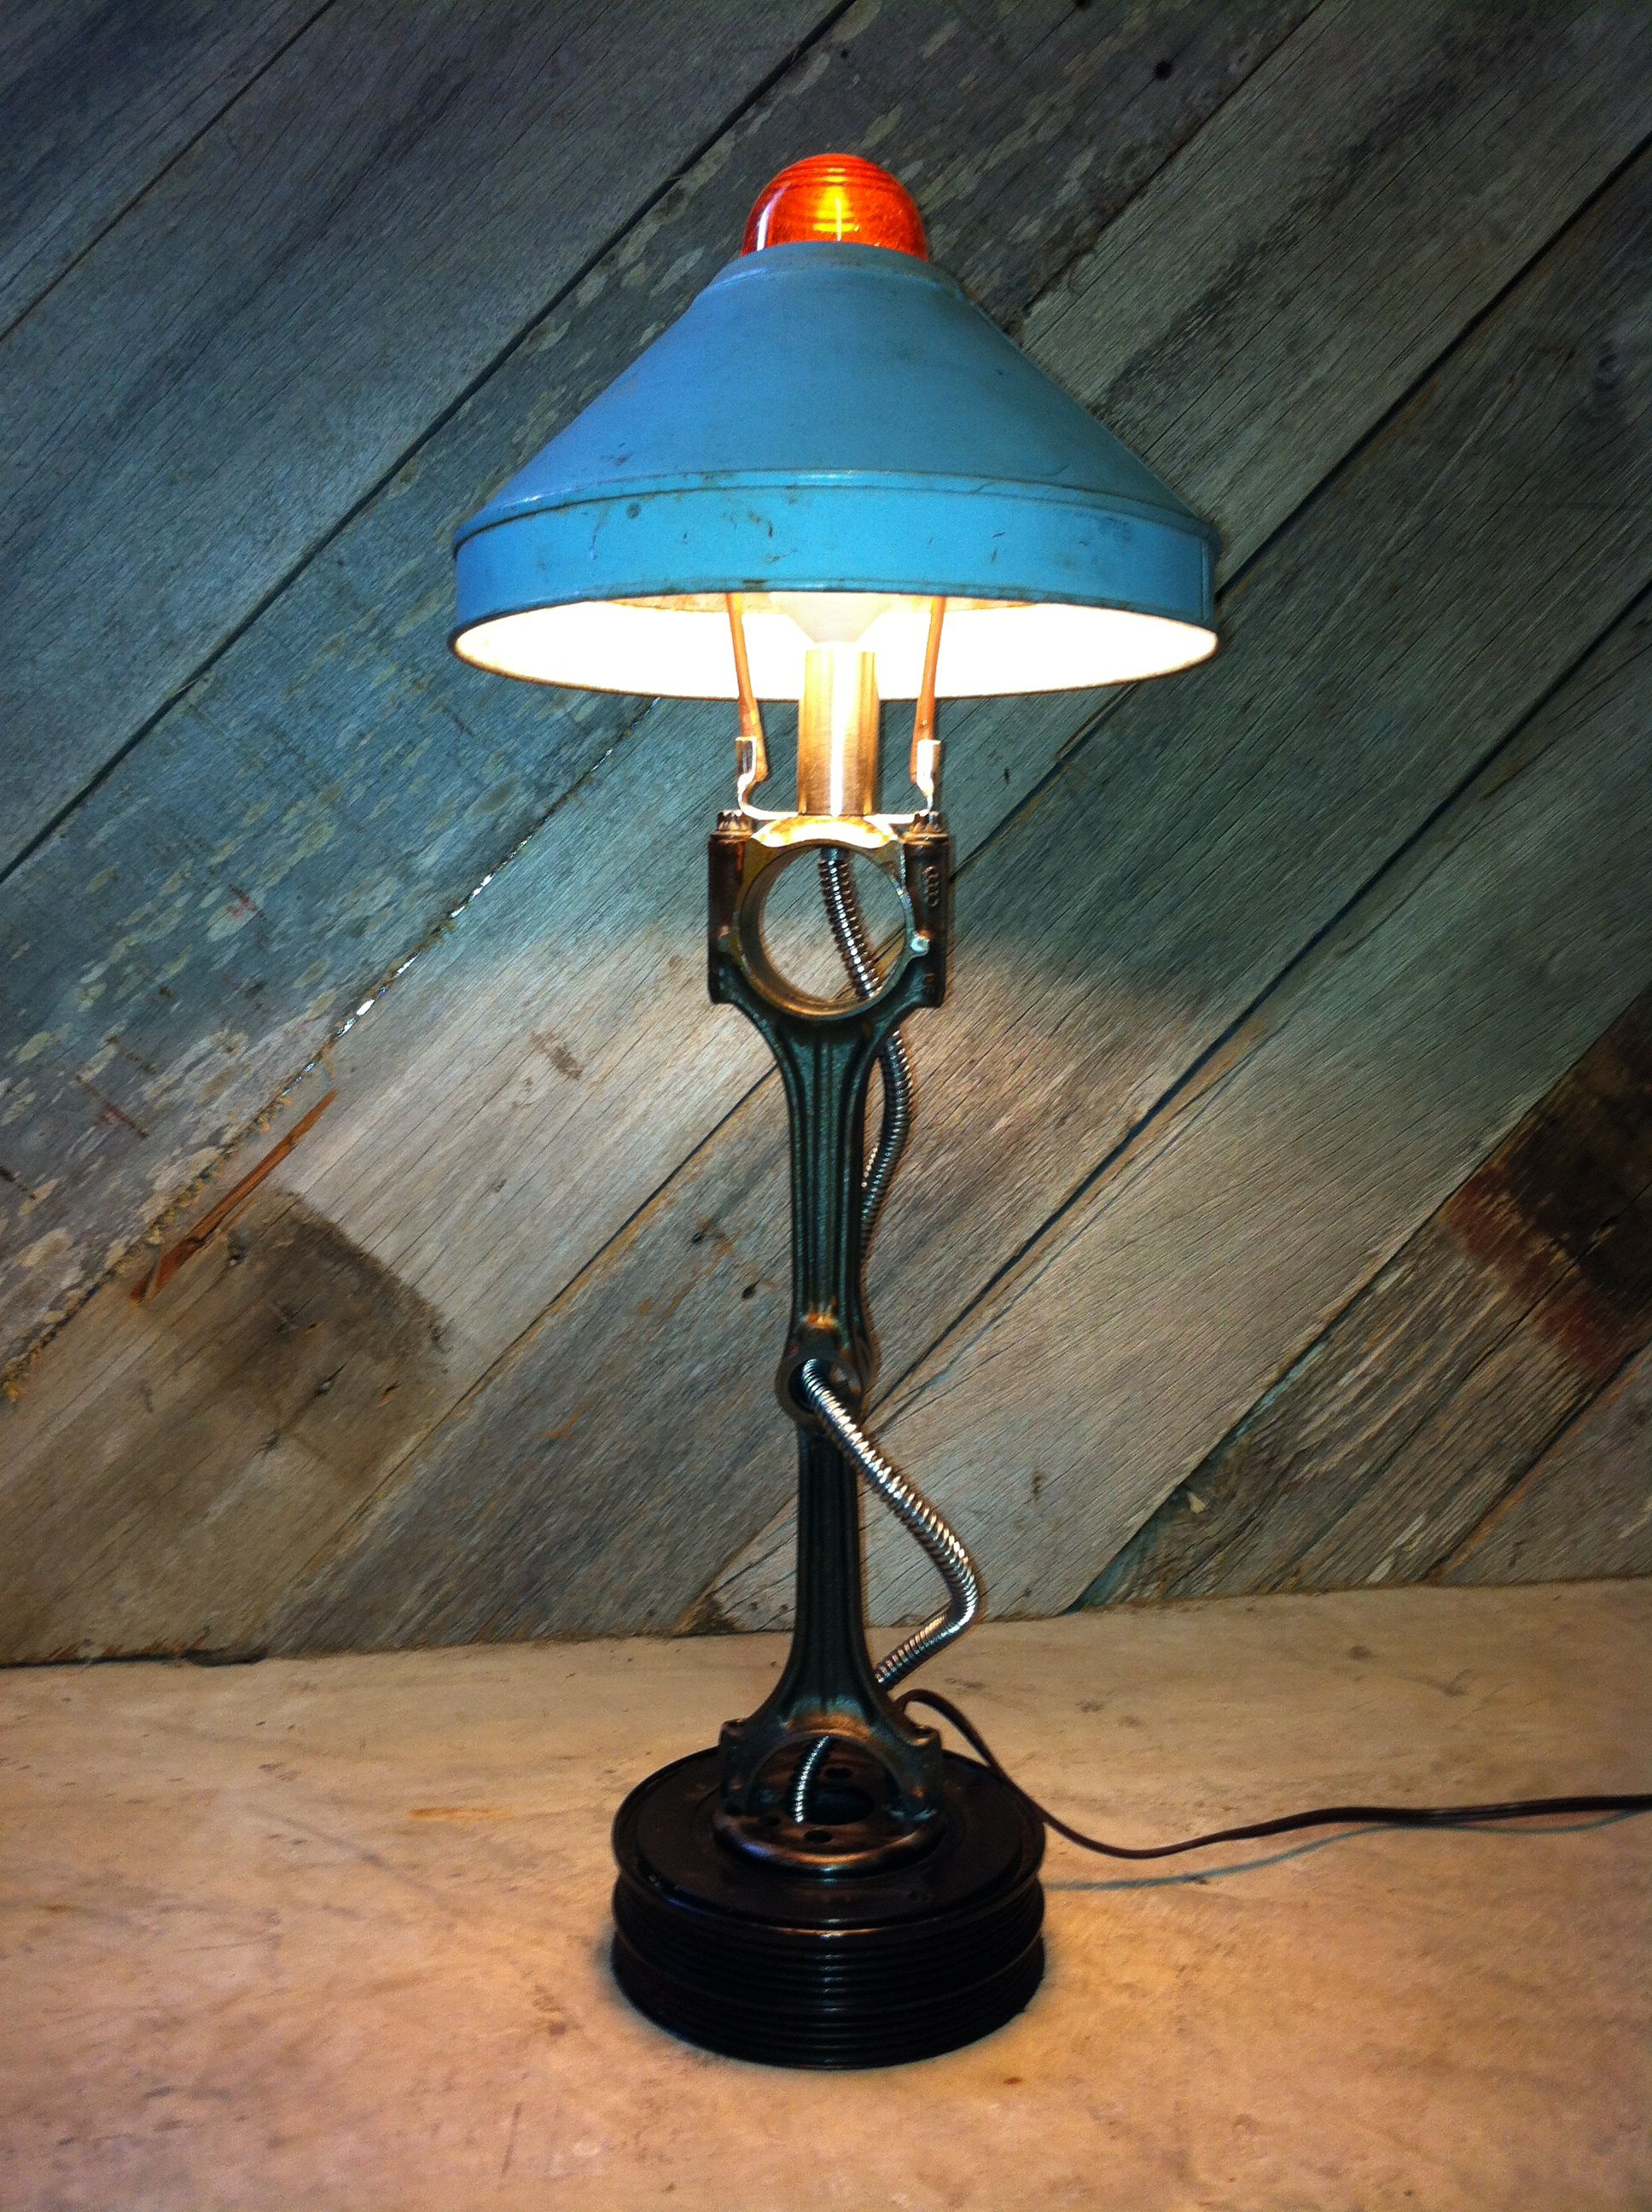 autonome product distributor hisle luxciole lampe lamp aluminum argent anodized portable contemporary prod